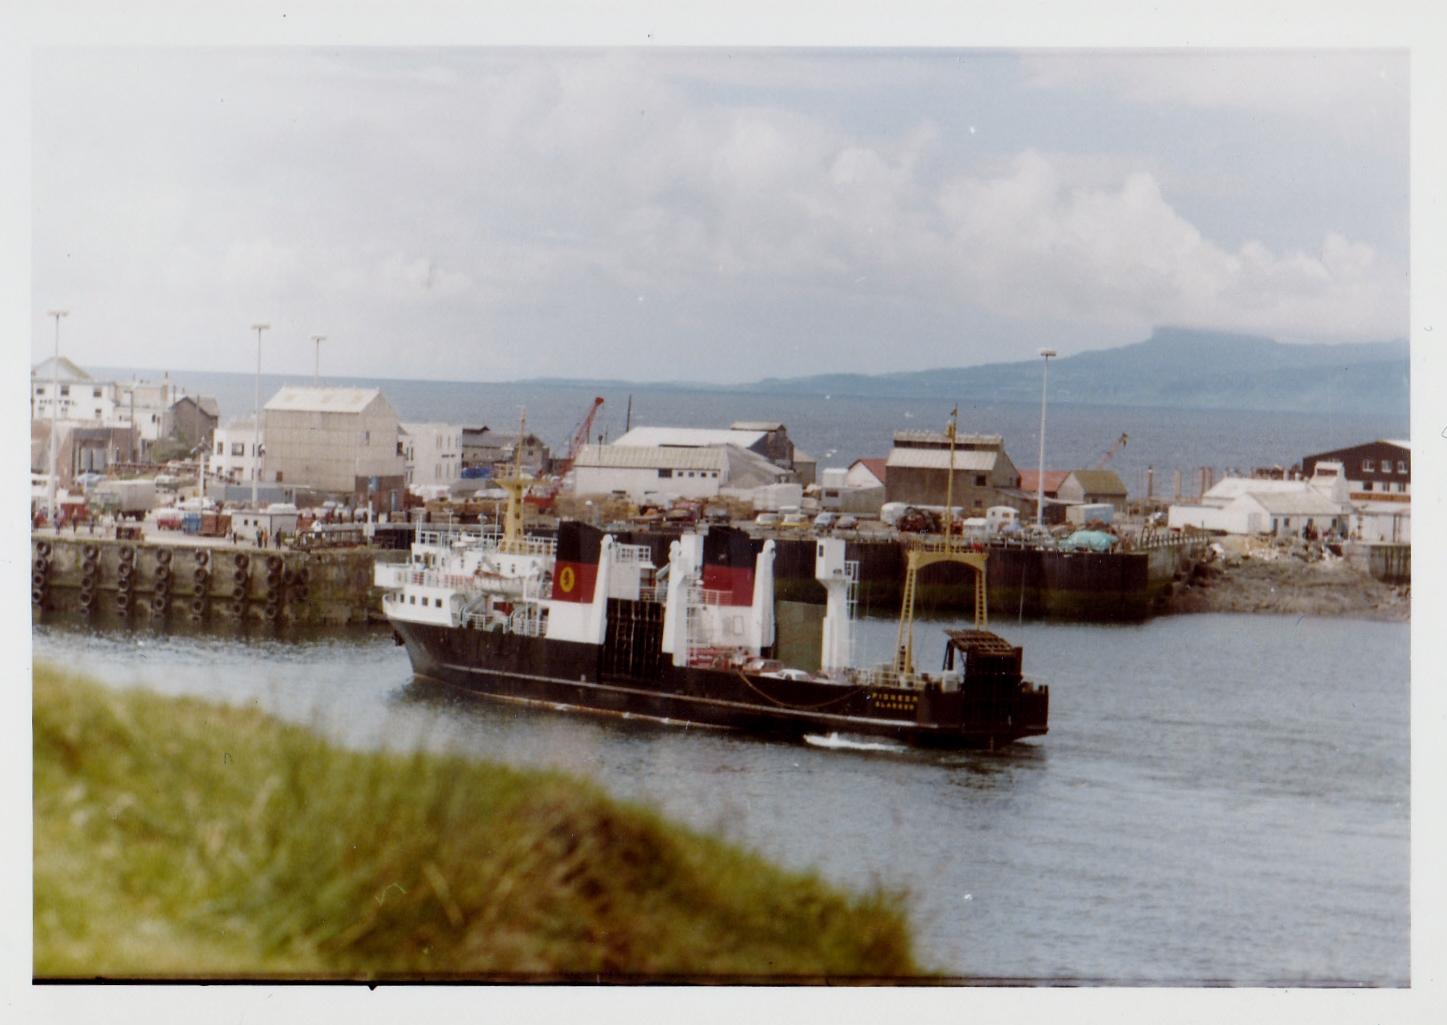 Pioneer at Mallaig